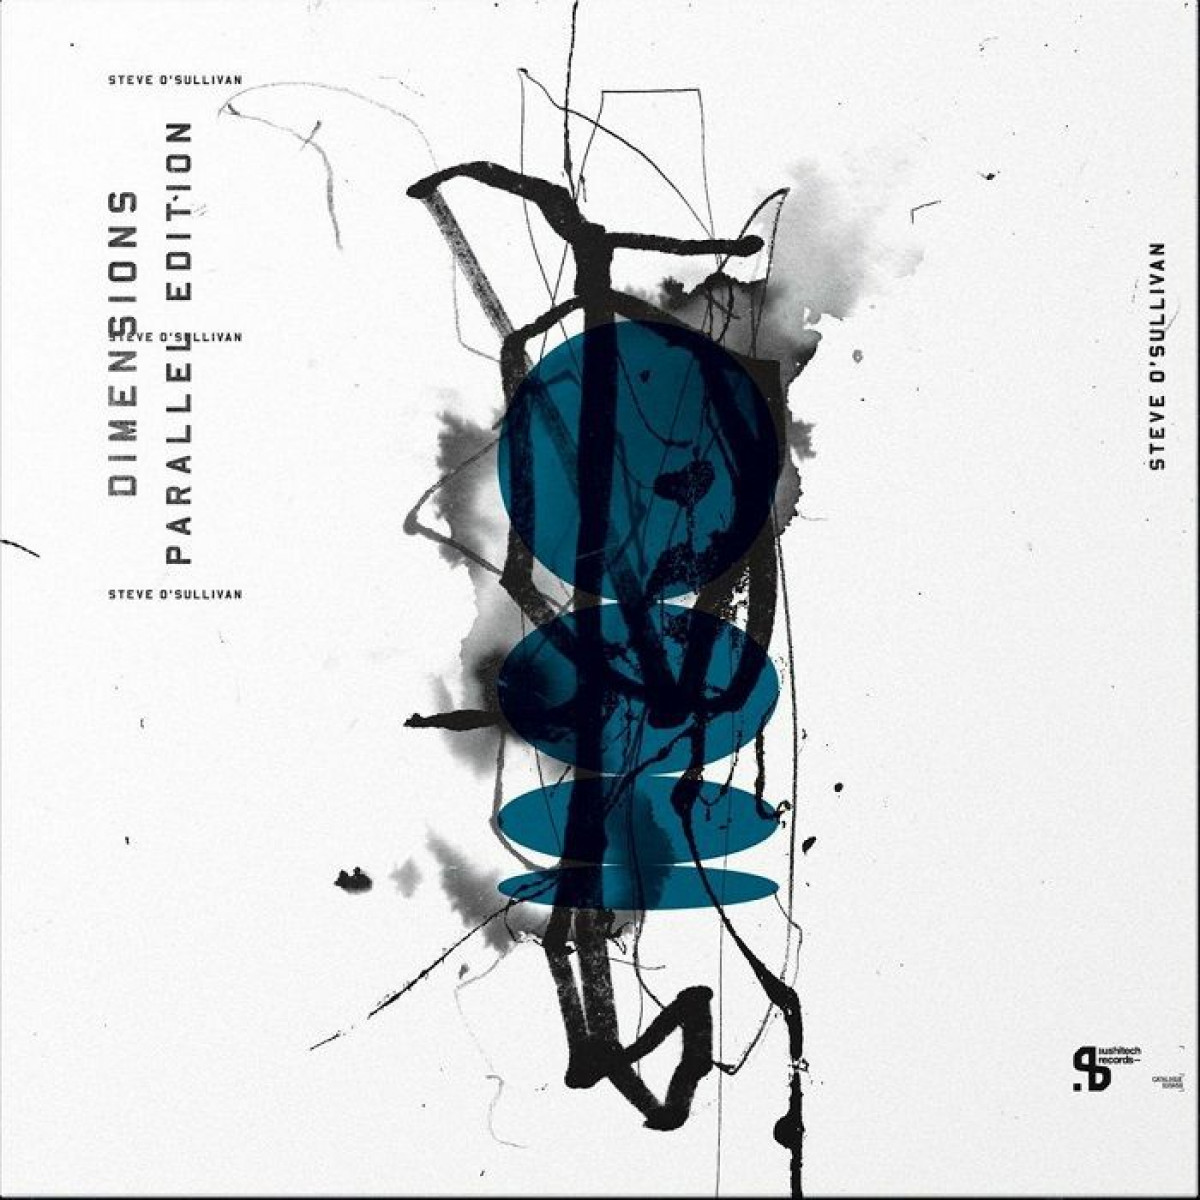 Steve O'Sullivan (incl Ricardo Villalobos, Dana Ruh, Thomas Melchior, Soela) - Dimensions Parallel Edition LP [Sushitech]